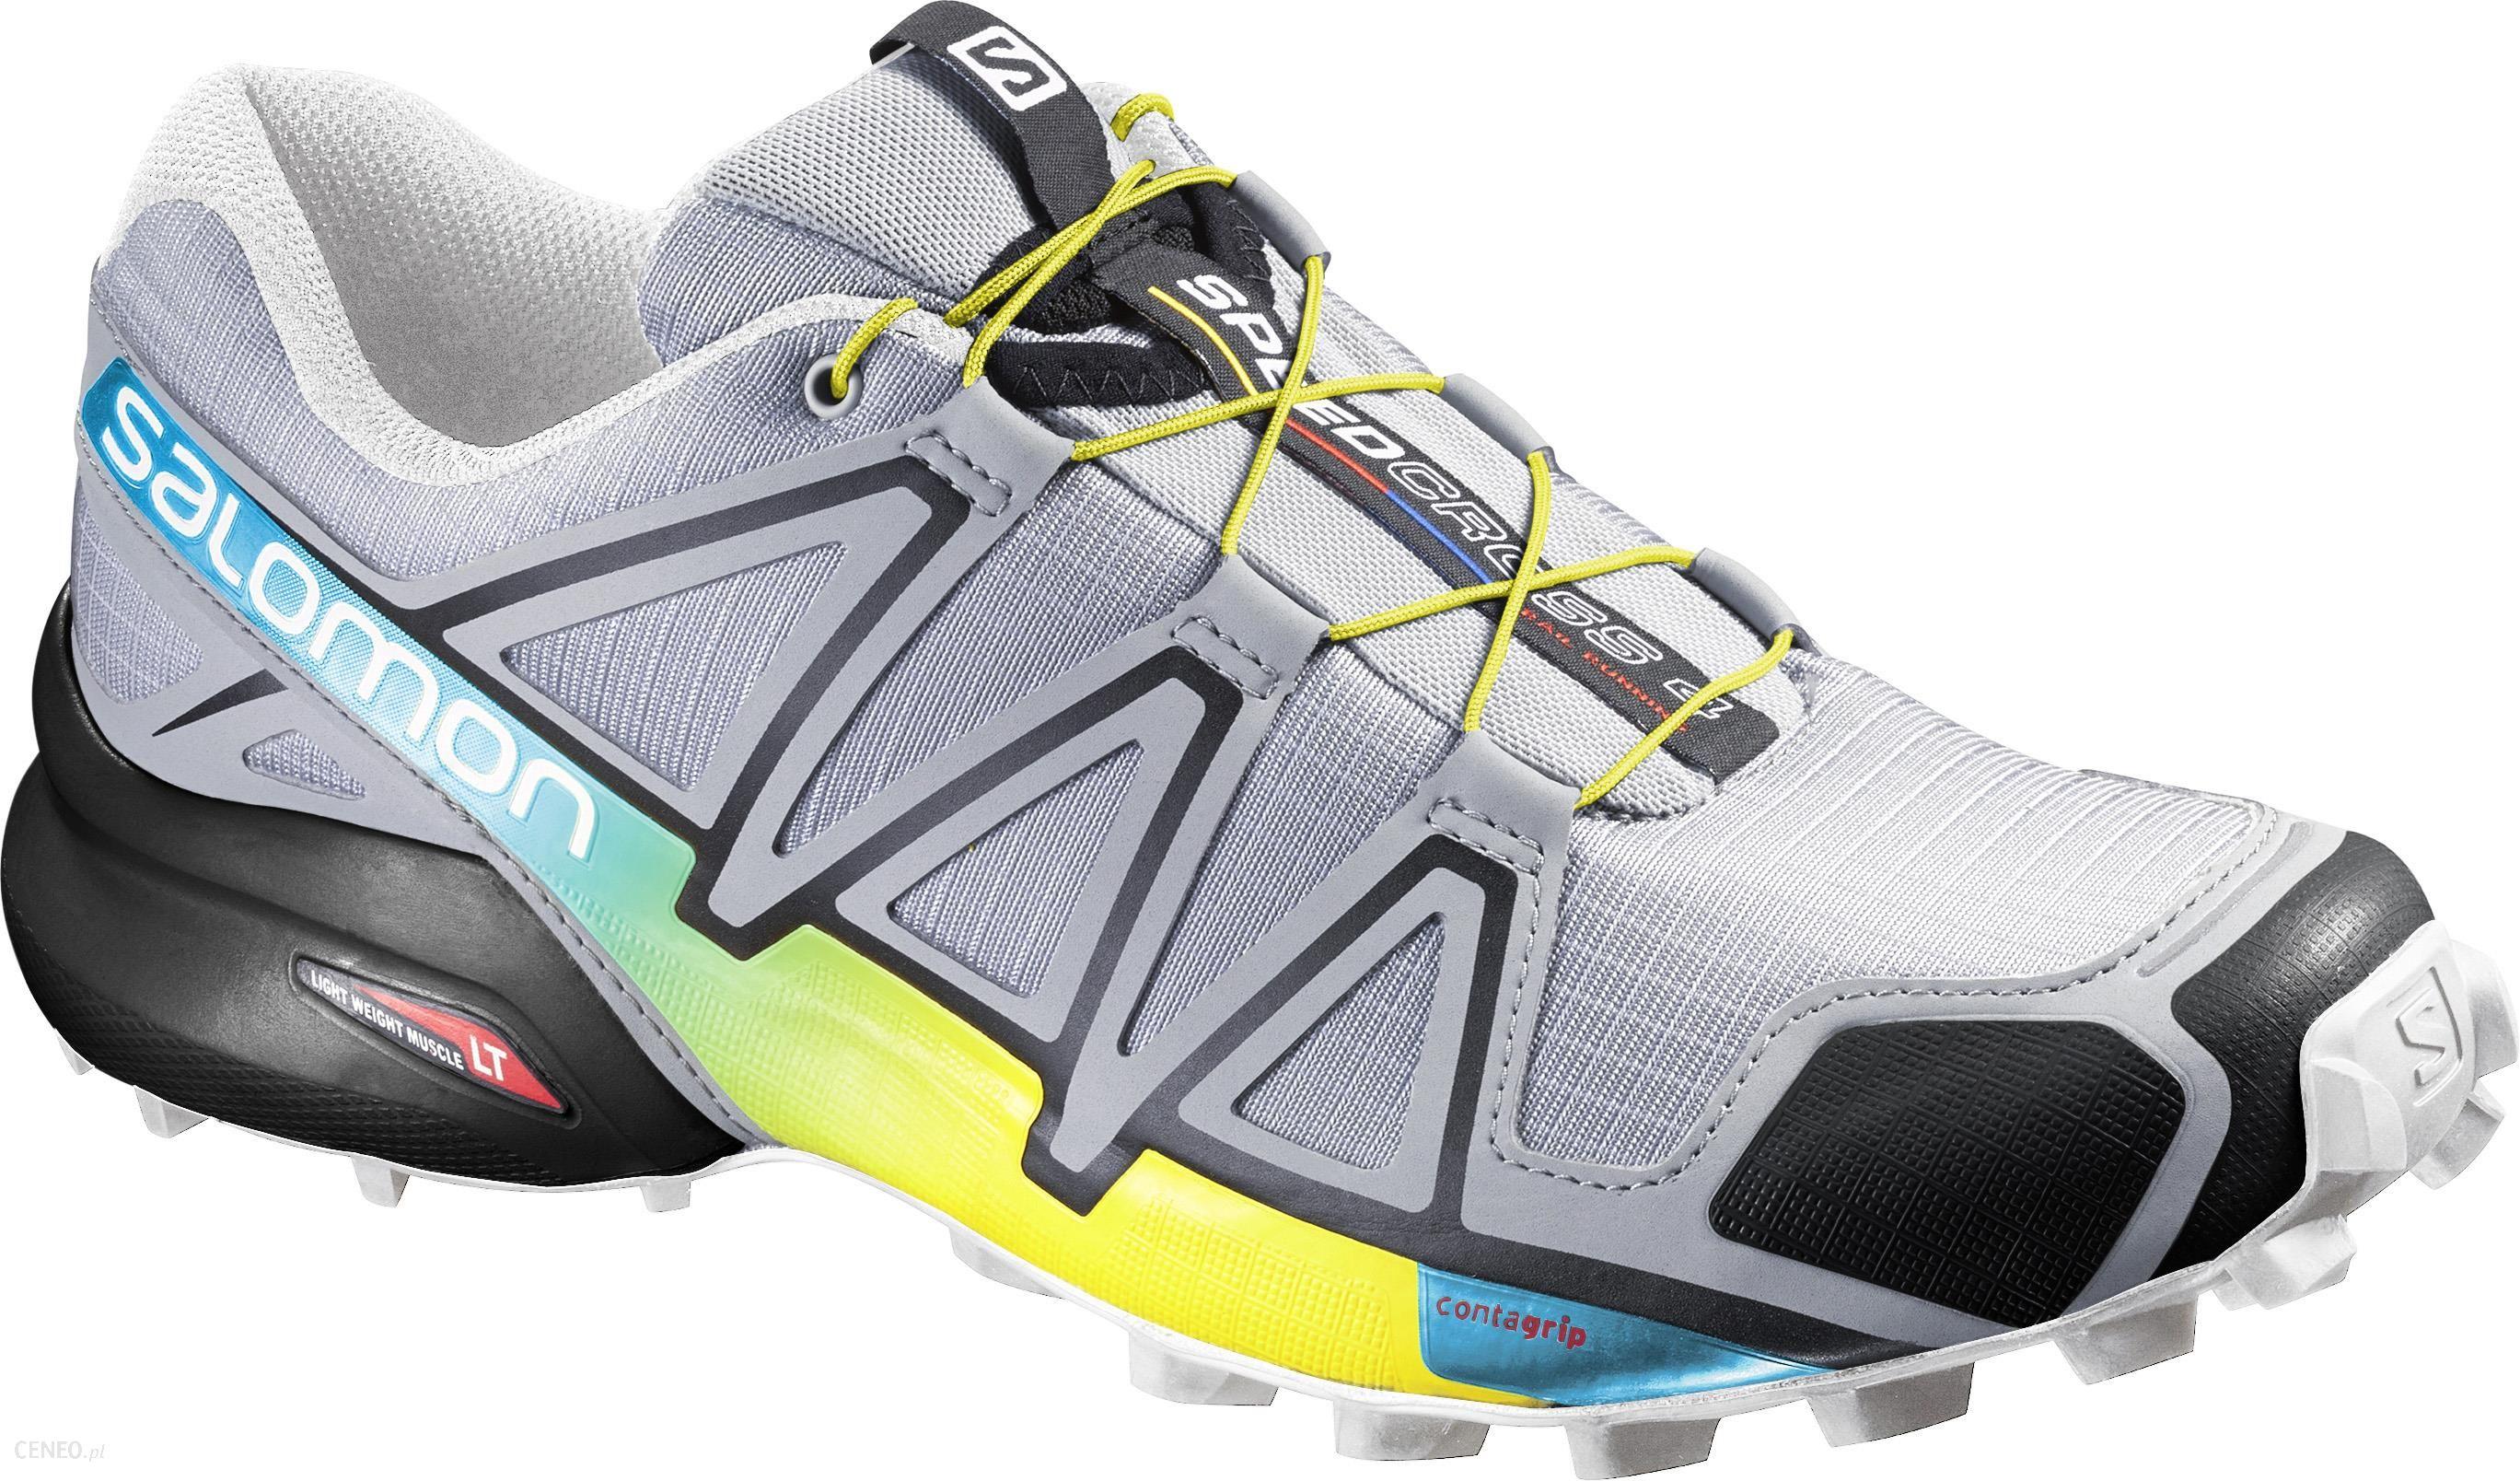 Salomon Speedcross 4 Light Onix 383131